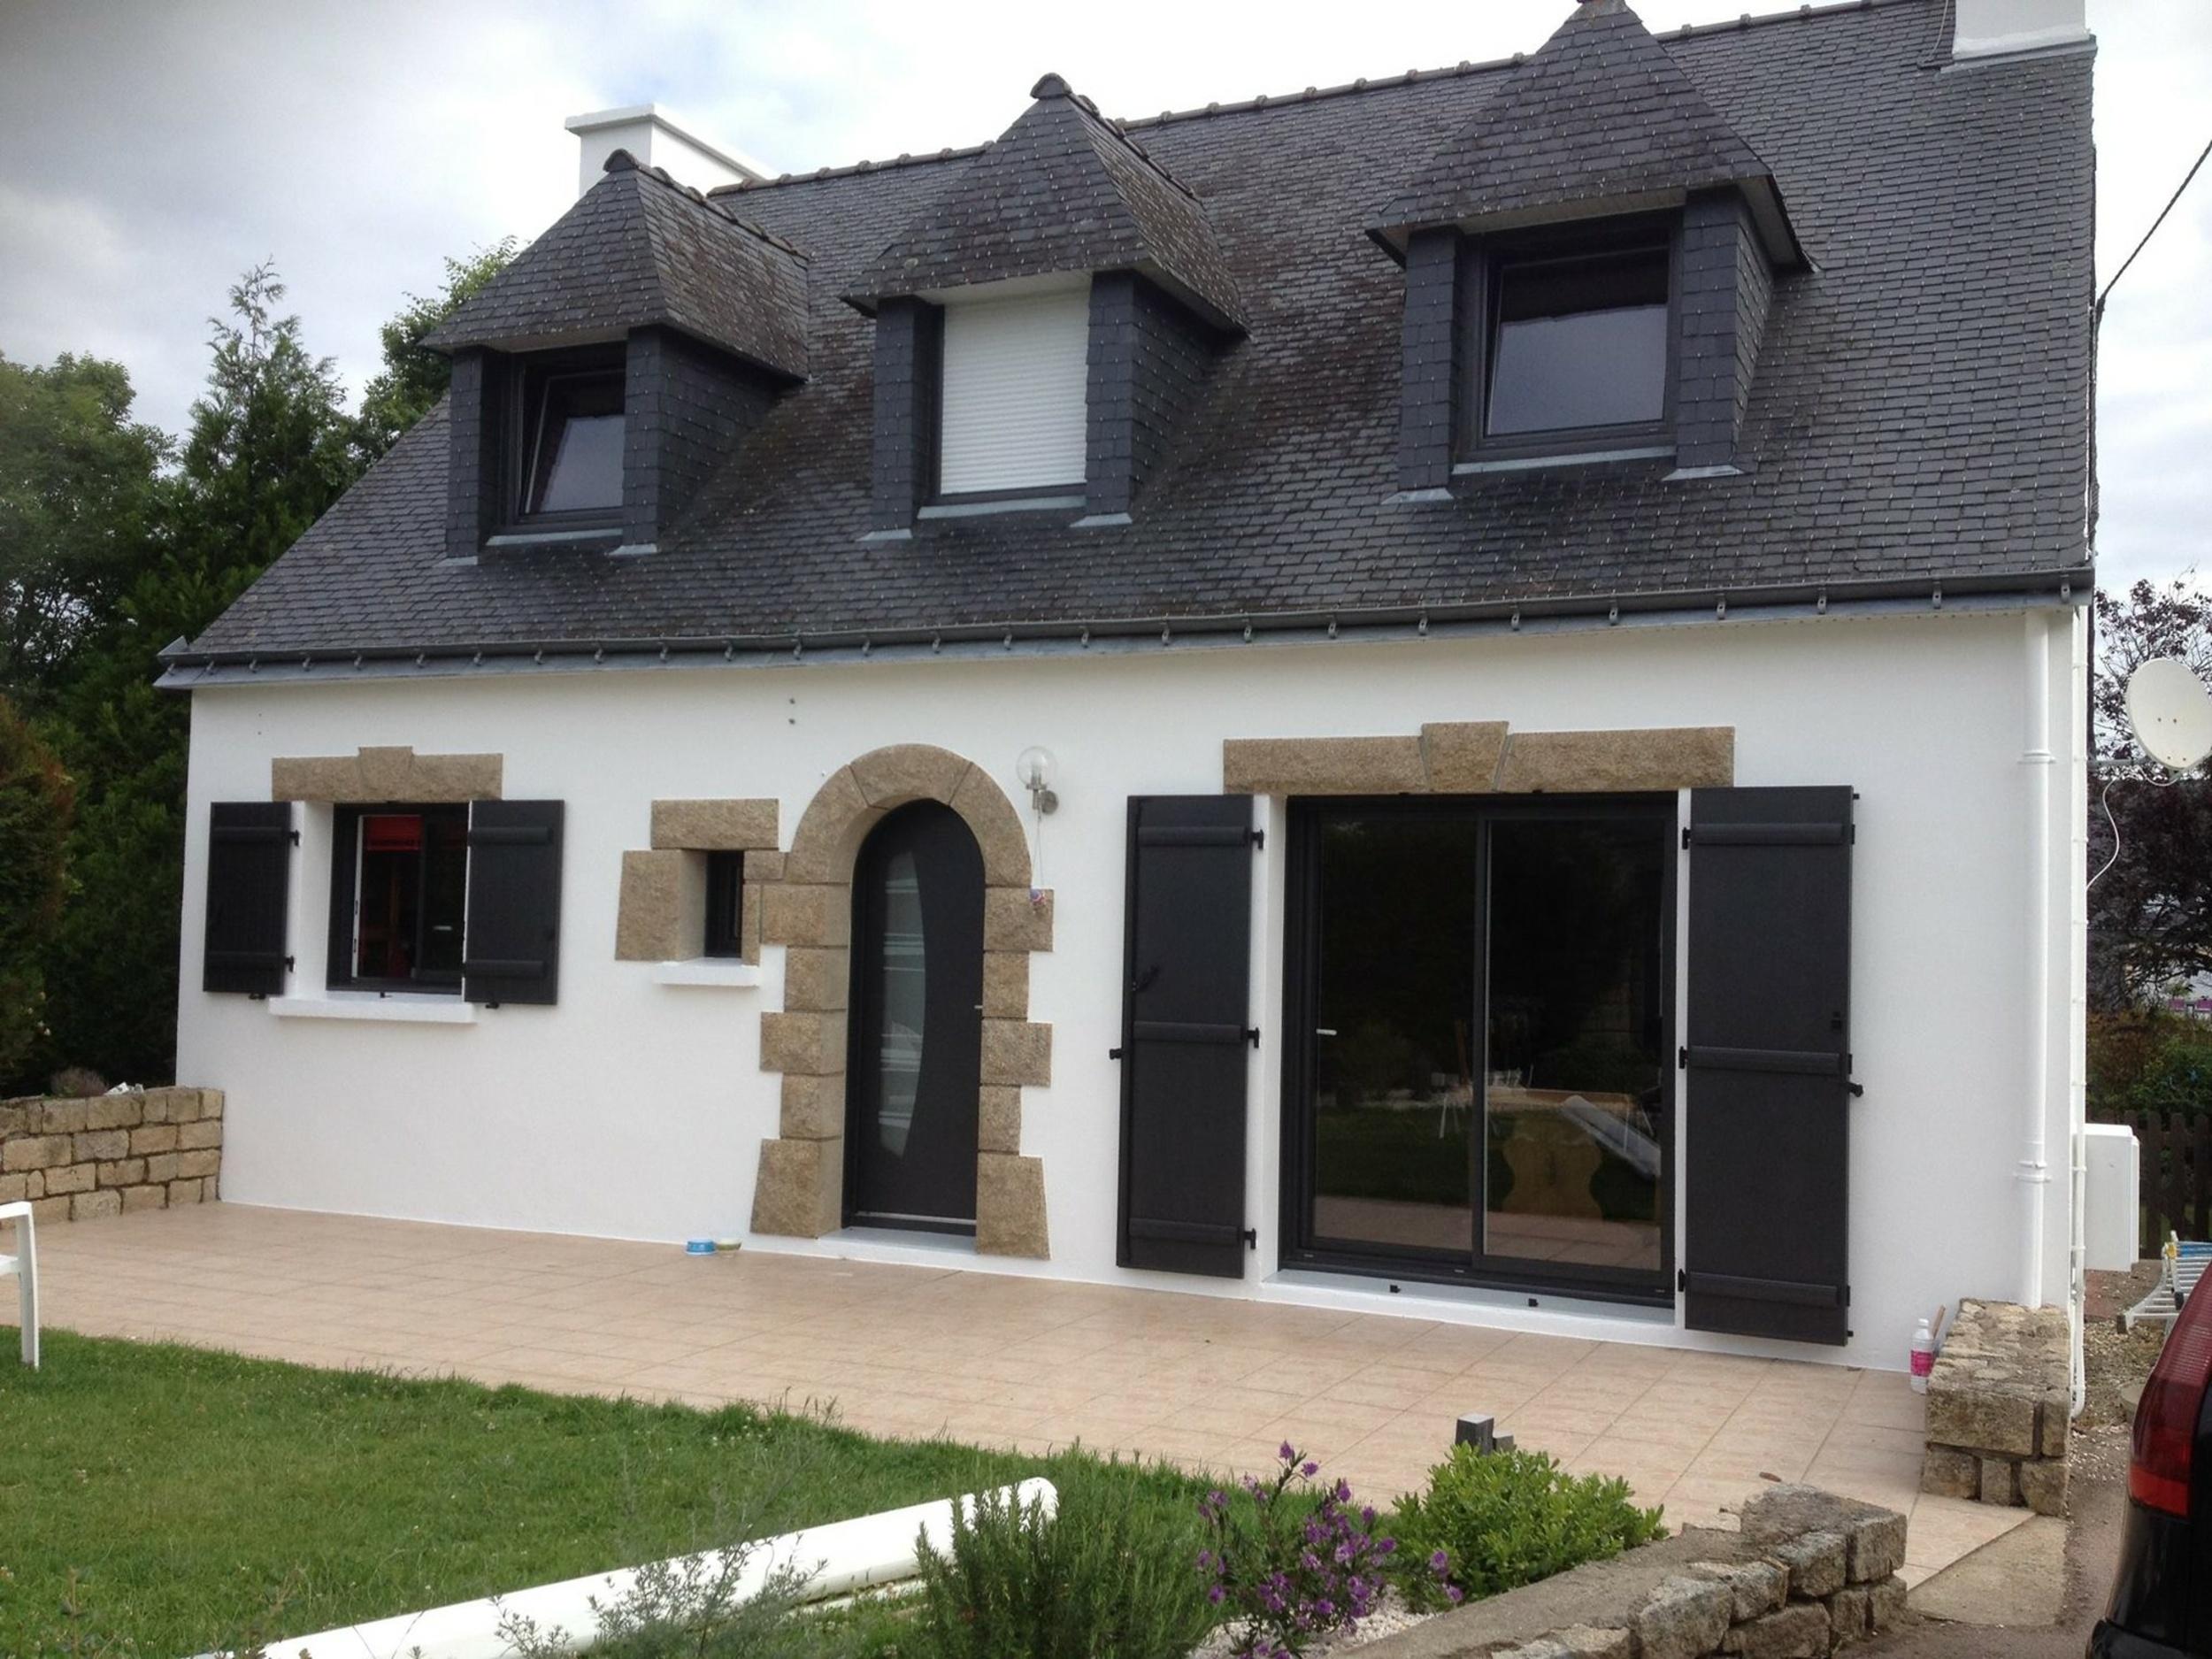 Installation de menuiseries extérieures - Morbihan (56)